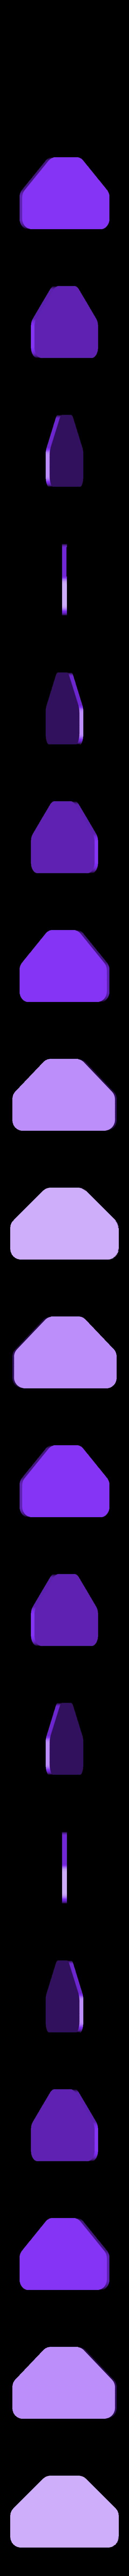 Weight_cap.stl Download free STL file Quadrant (Sexstant predecessor) - Celestial navigation - NO Supports • 3D printing design, Mirketto